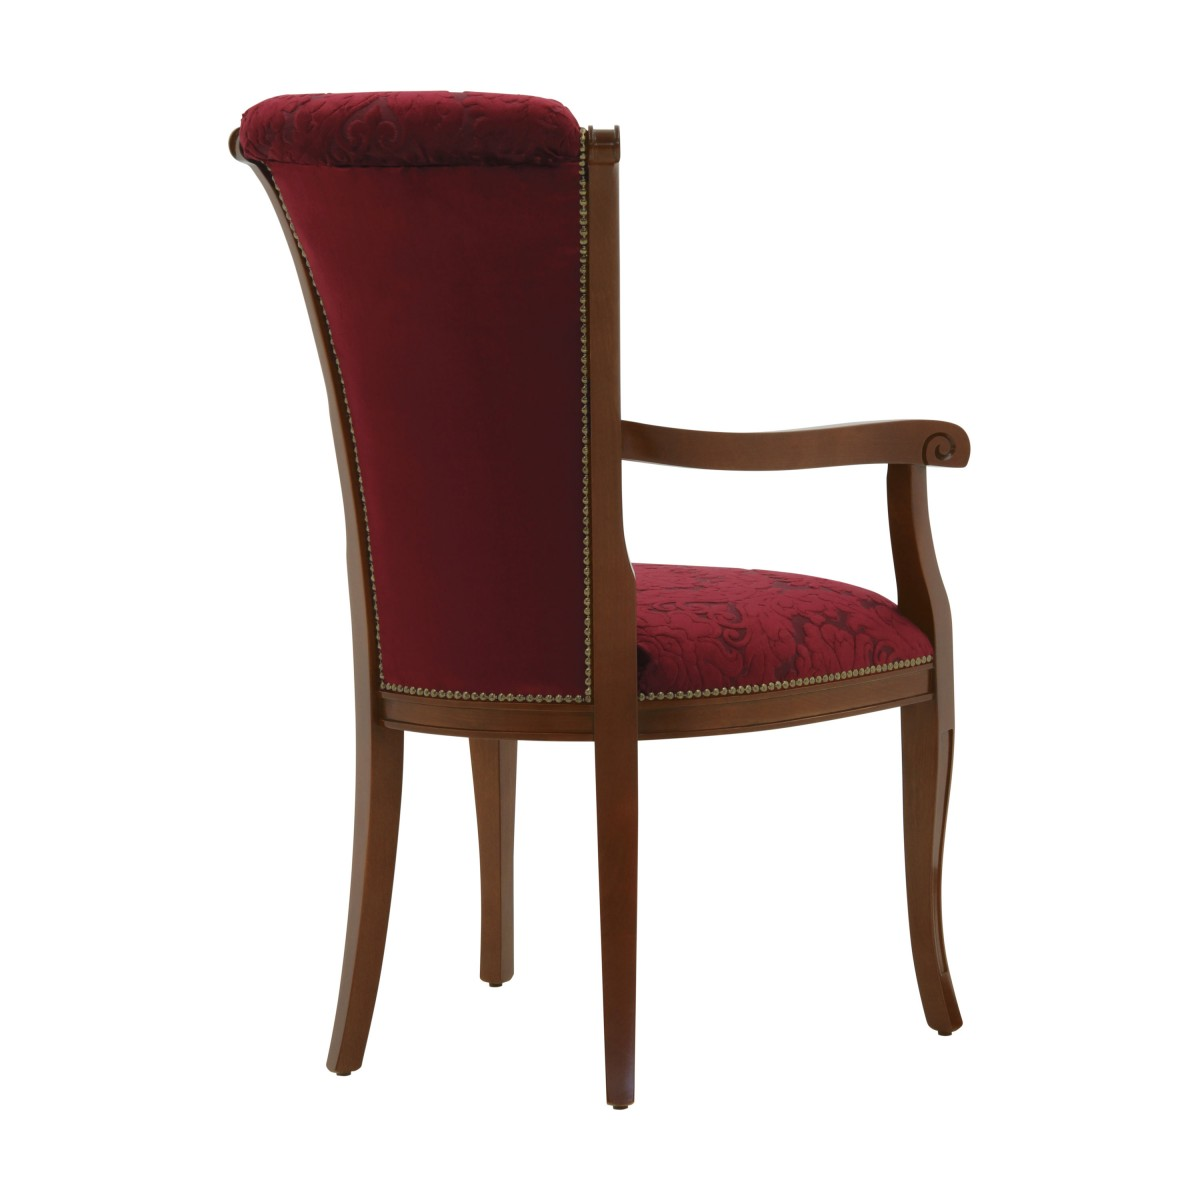 Small armchair Brooklyn - Sevensedie